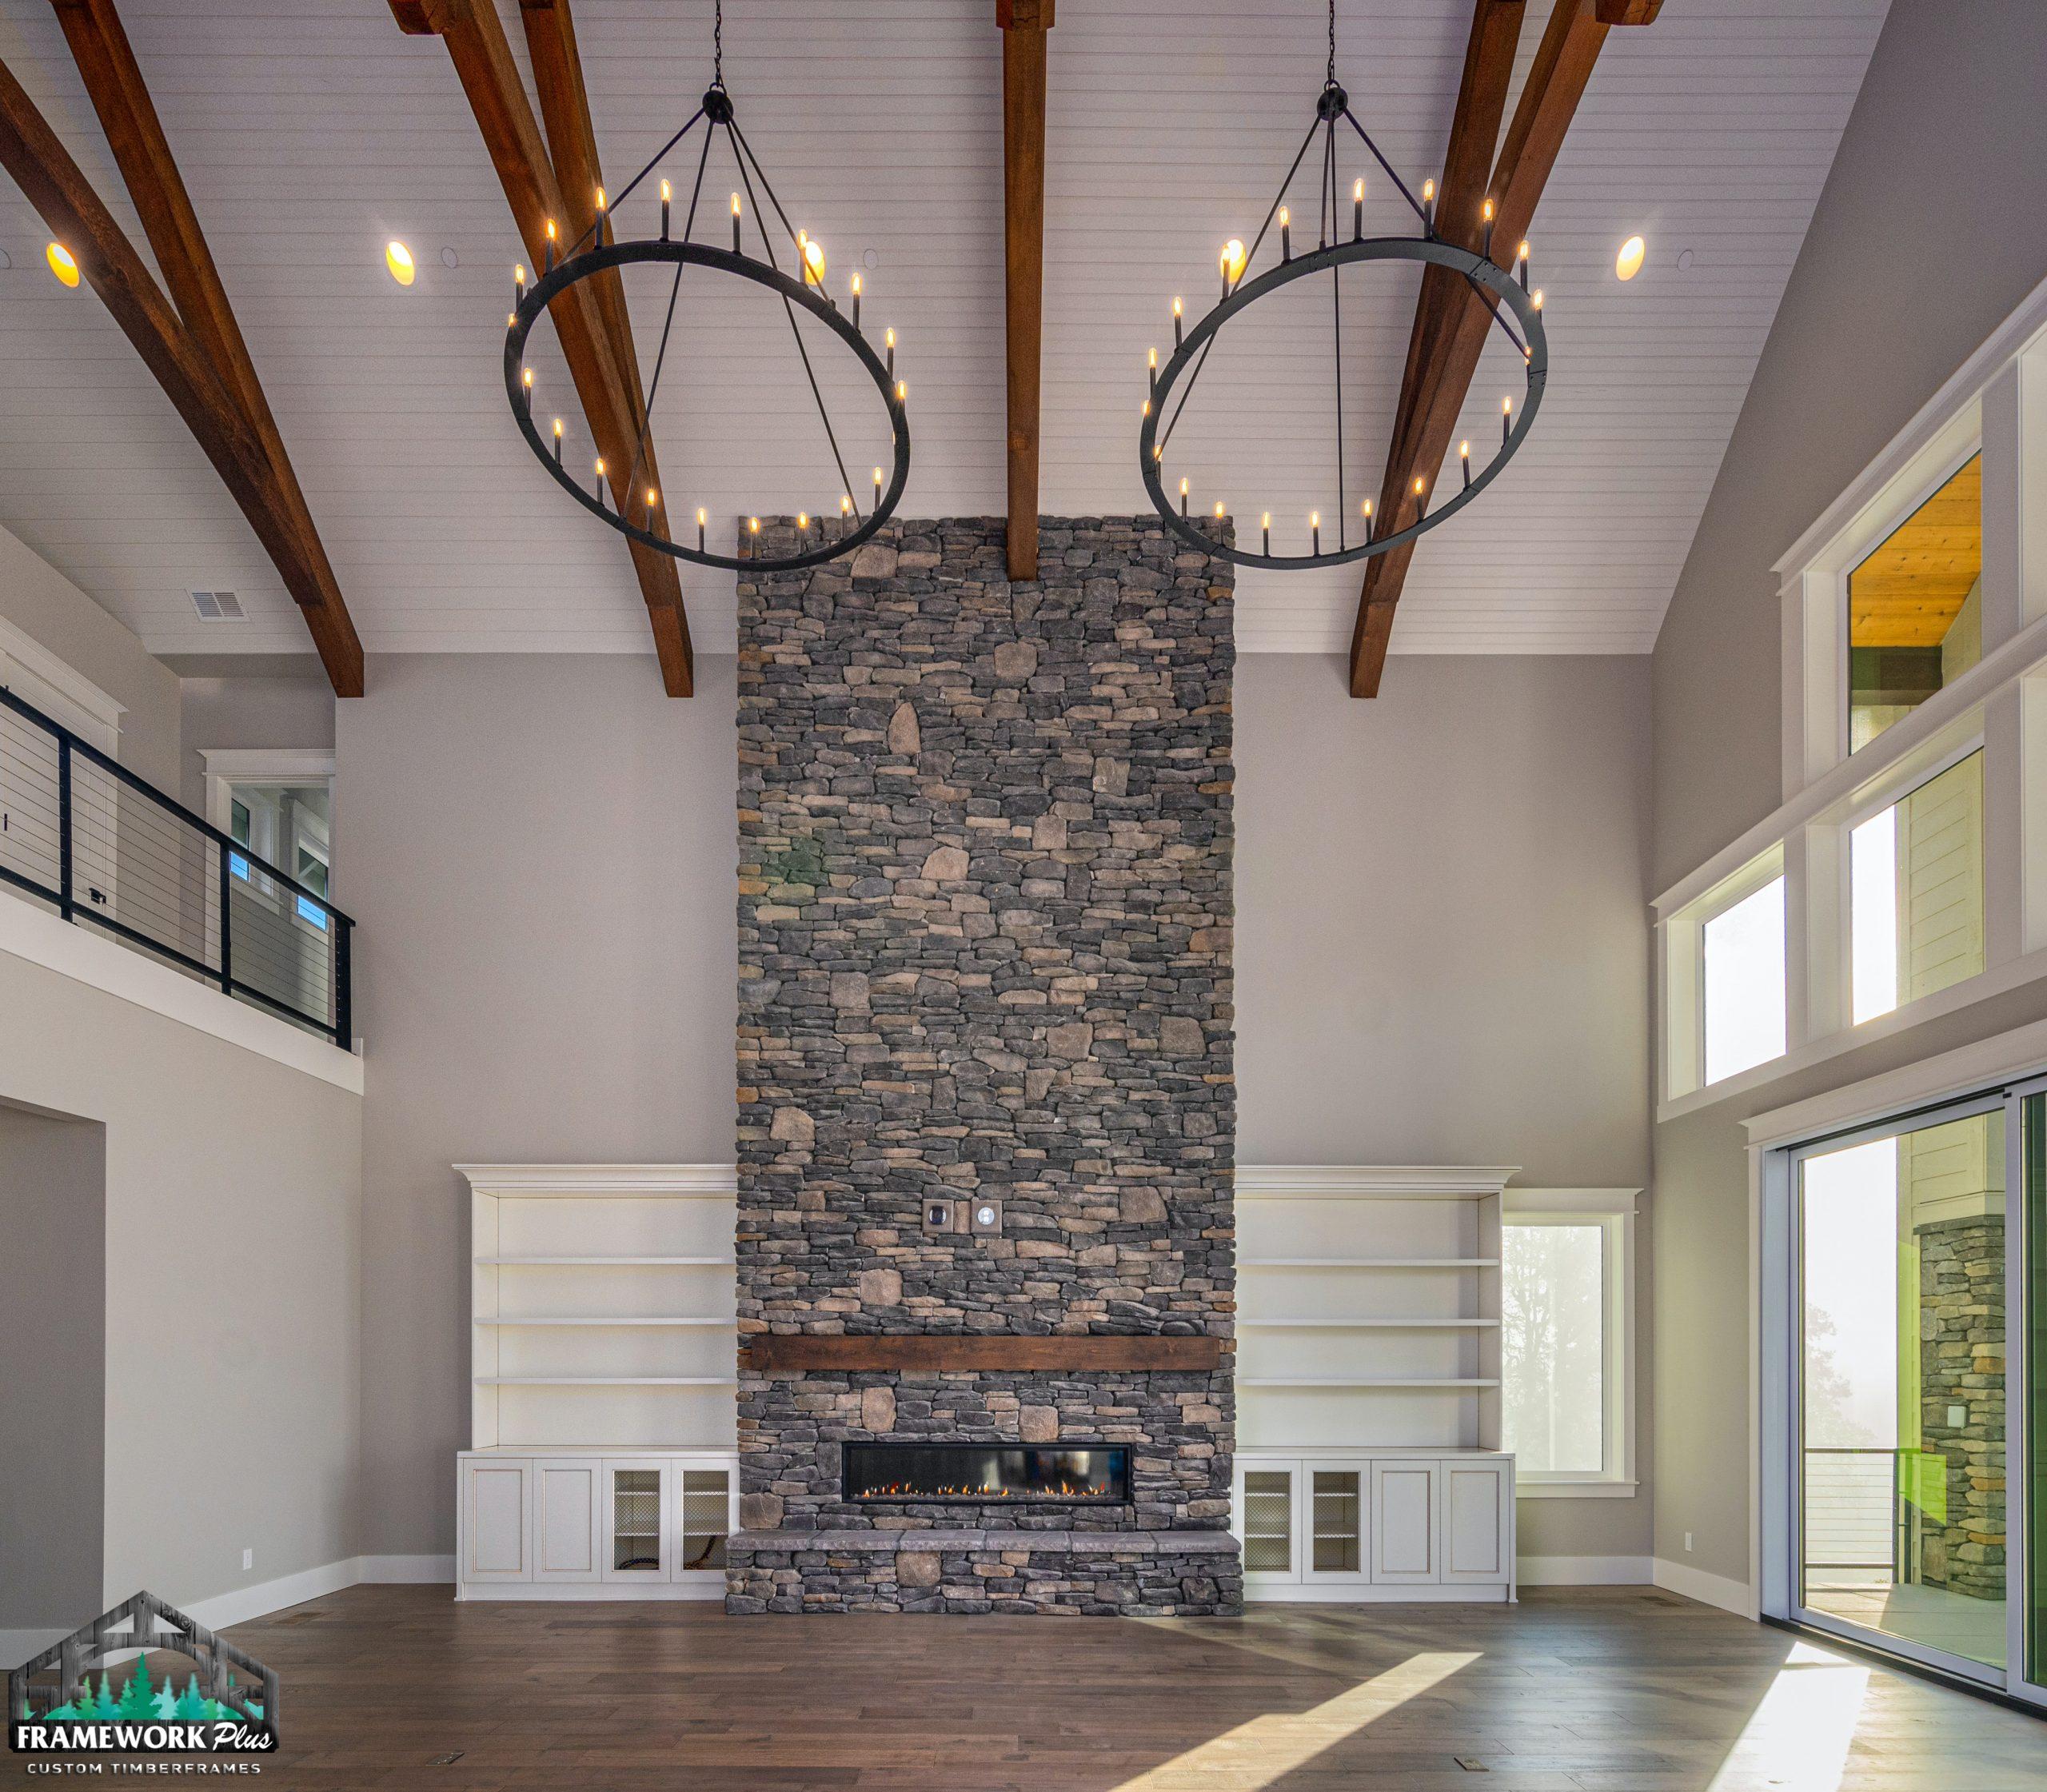 Clark Hill Estate Interior Truss and Fireplace